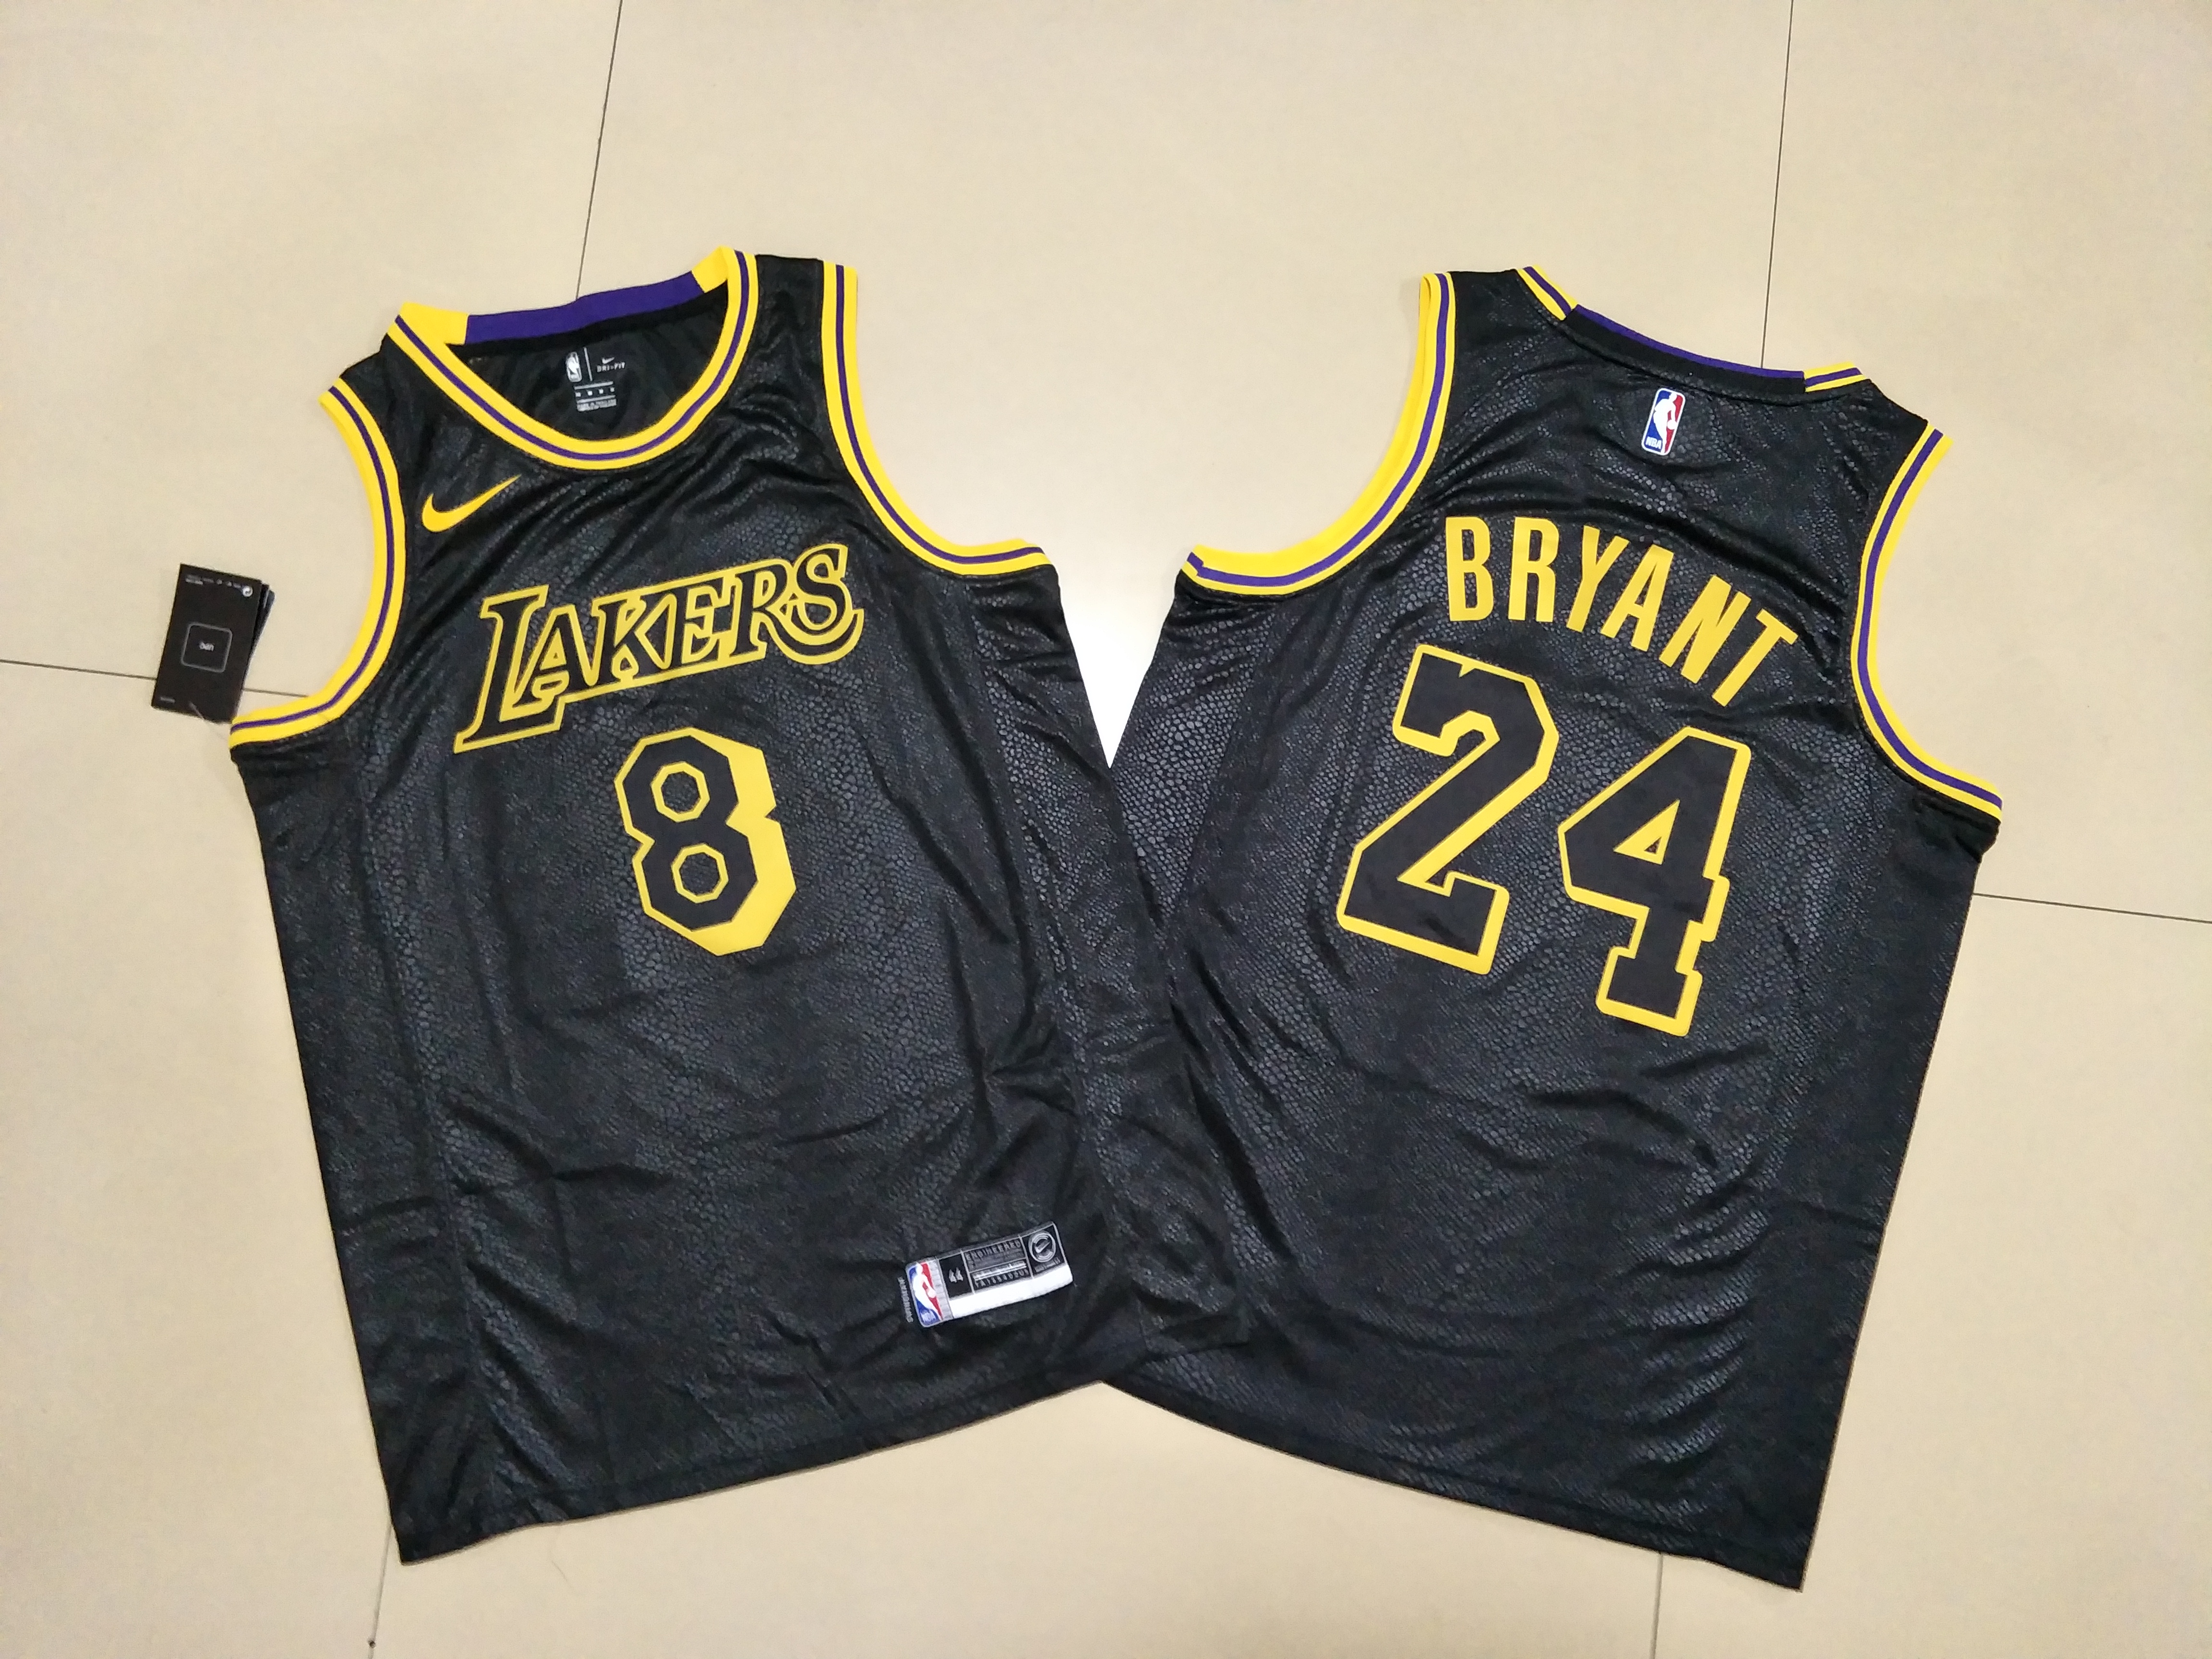 Lakers 8 & 24 Kobe Bryant Black Commemorative Swingman Jersey